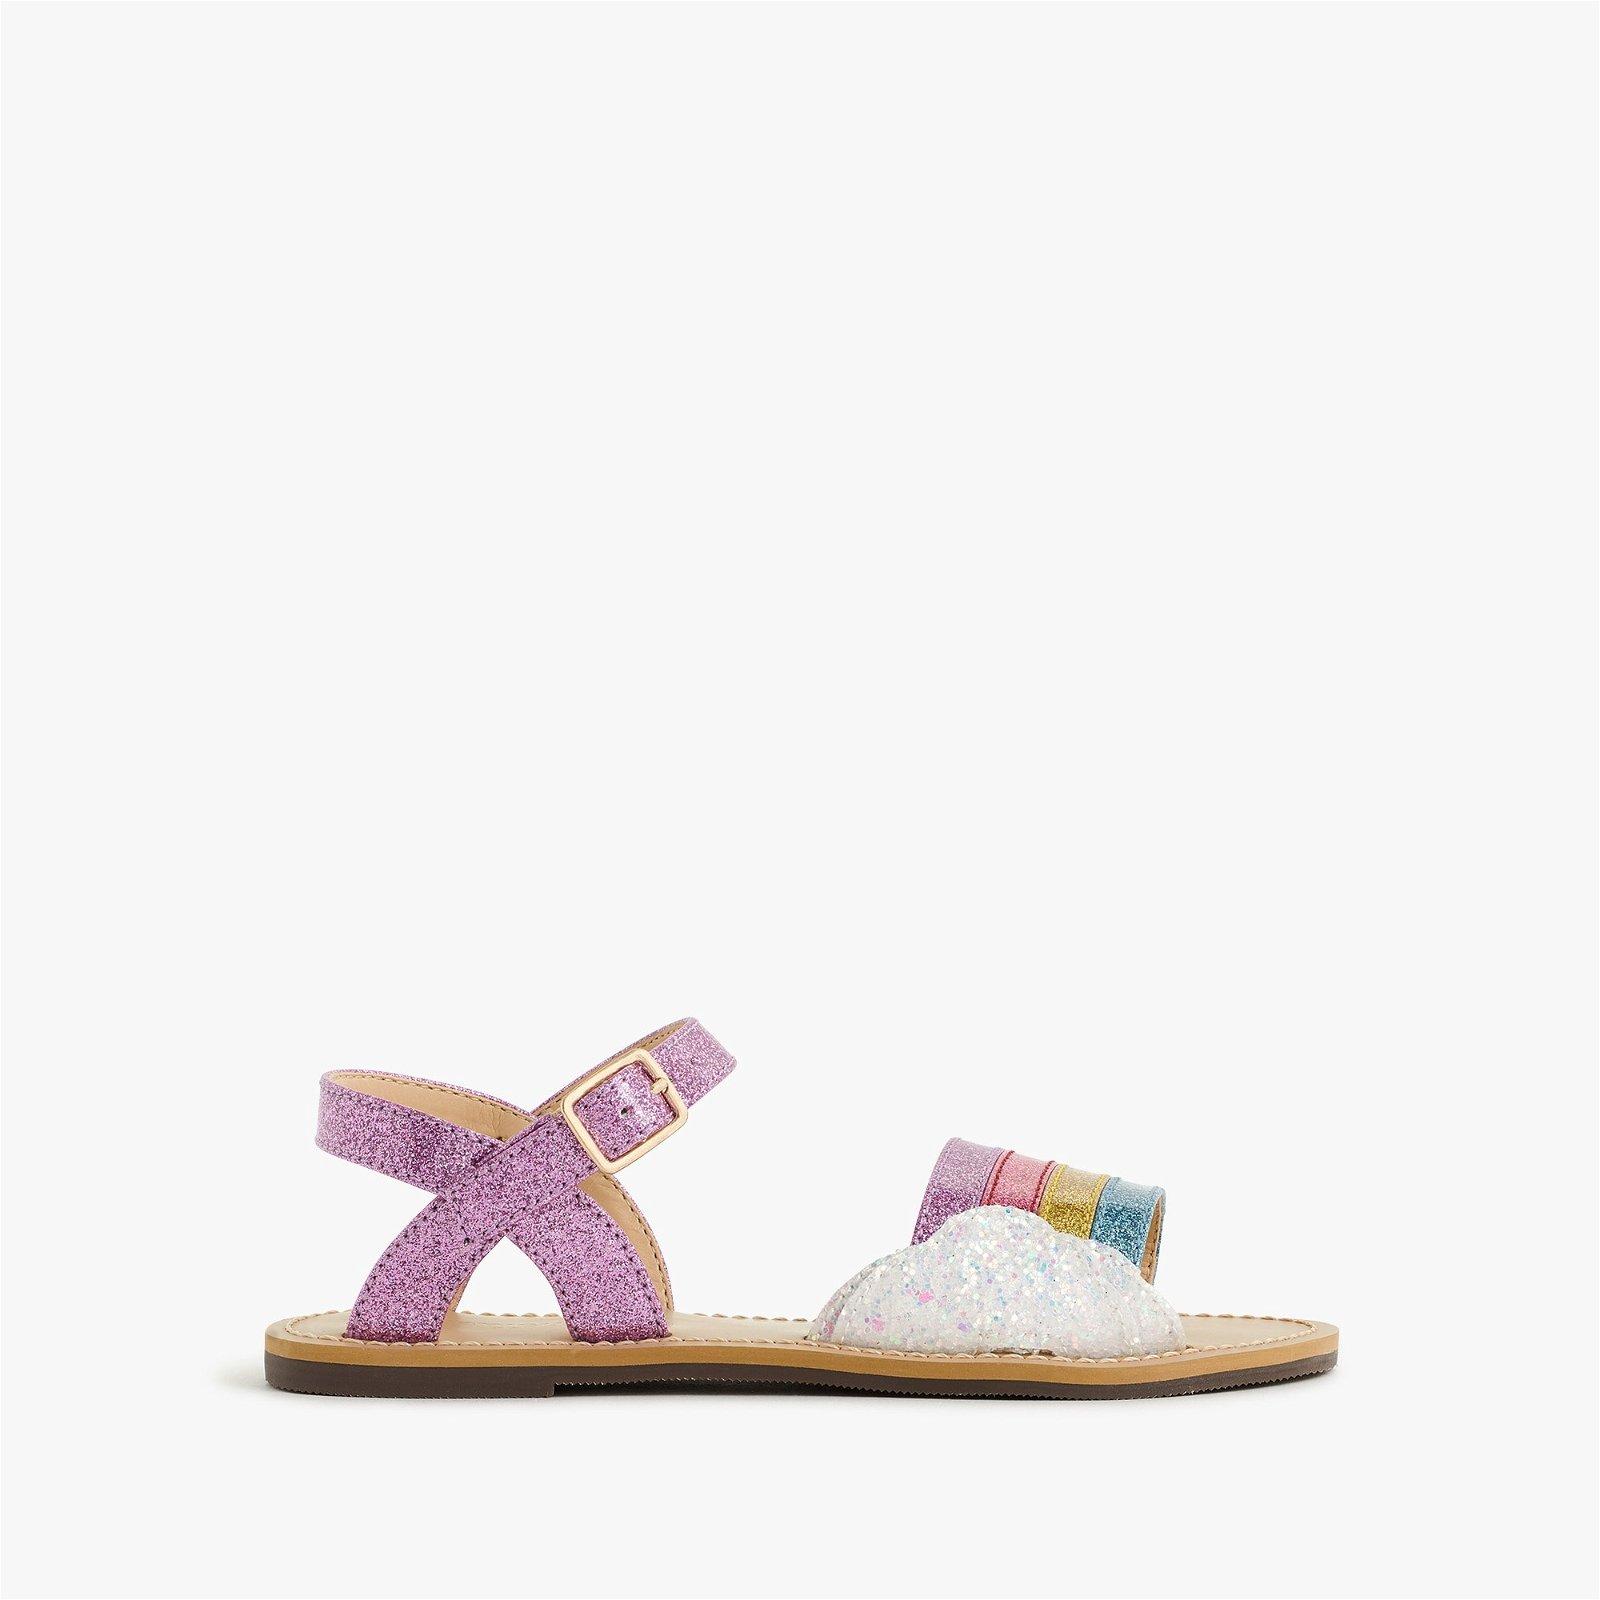 Girls' glitter rainbow sandals